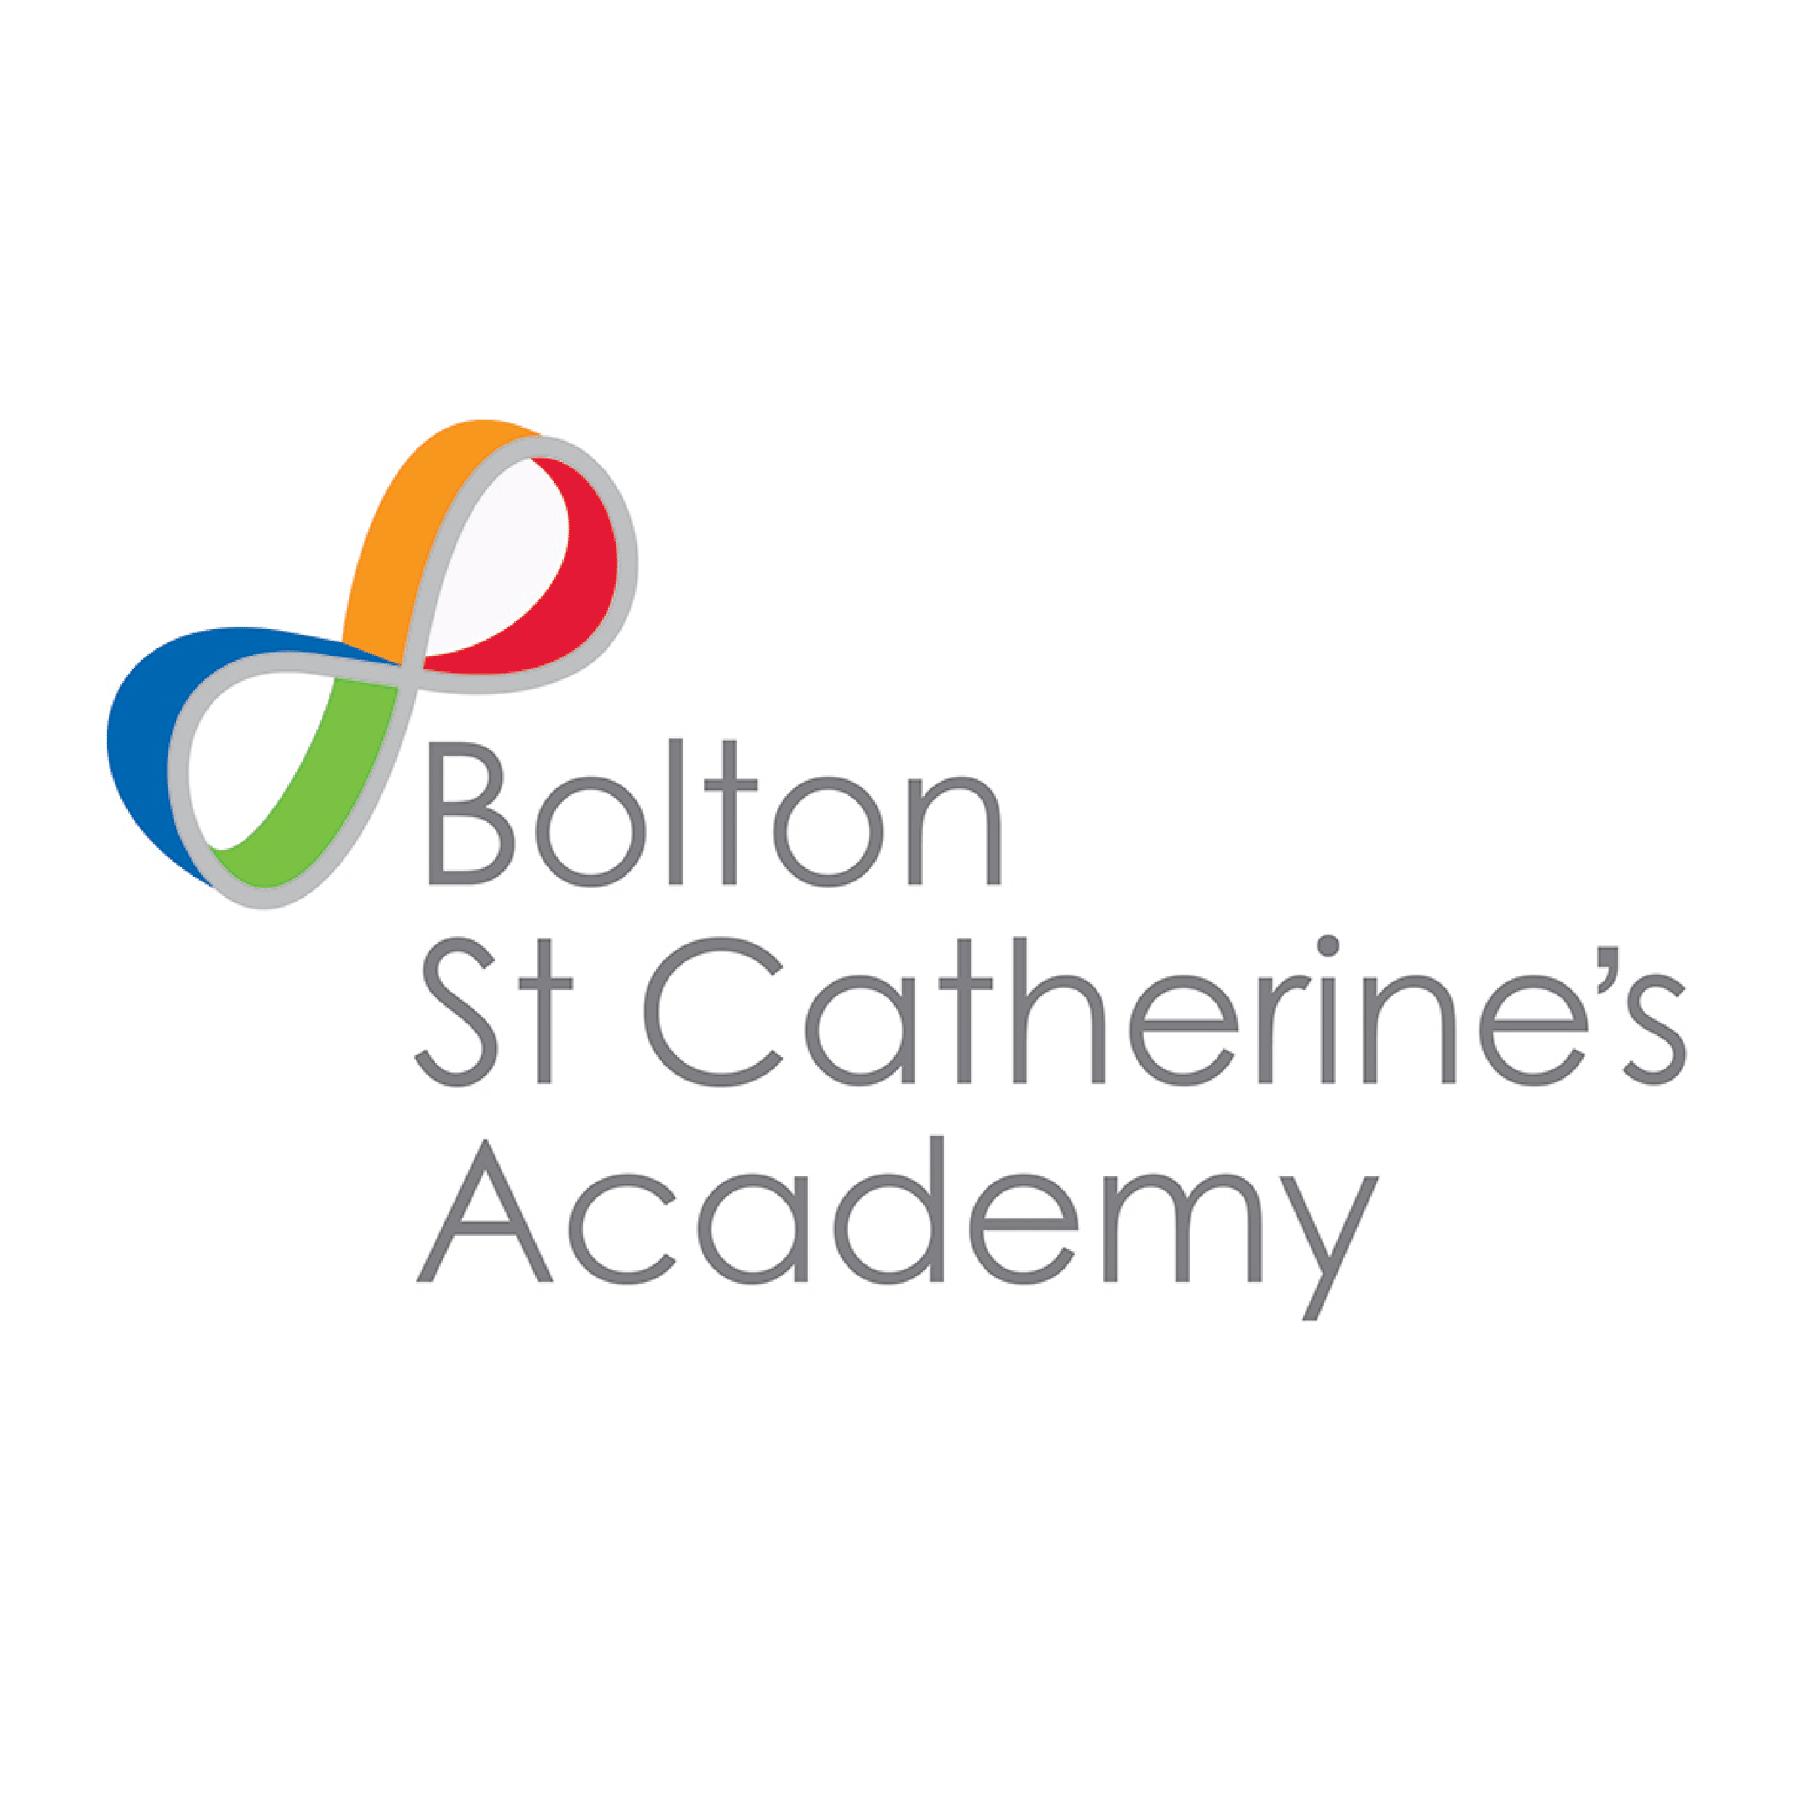 Bolton St Catherine's Academy Logo